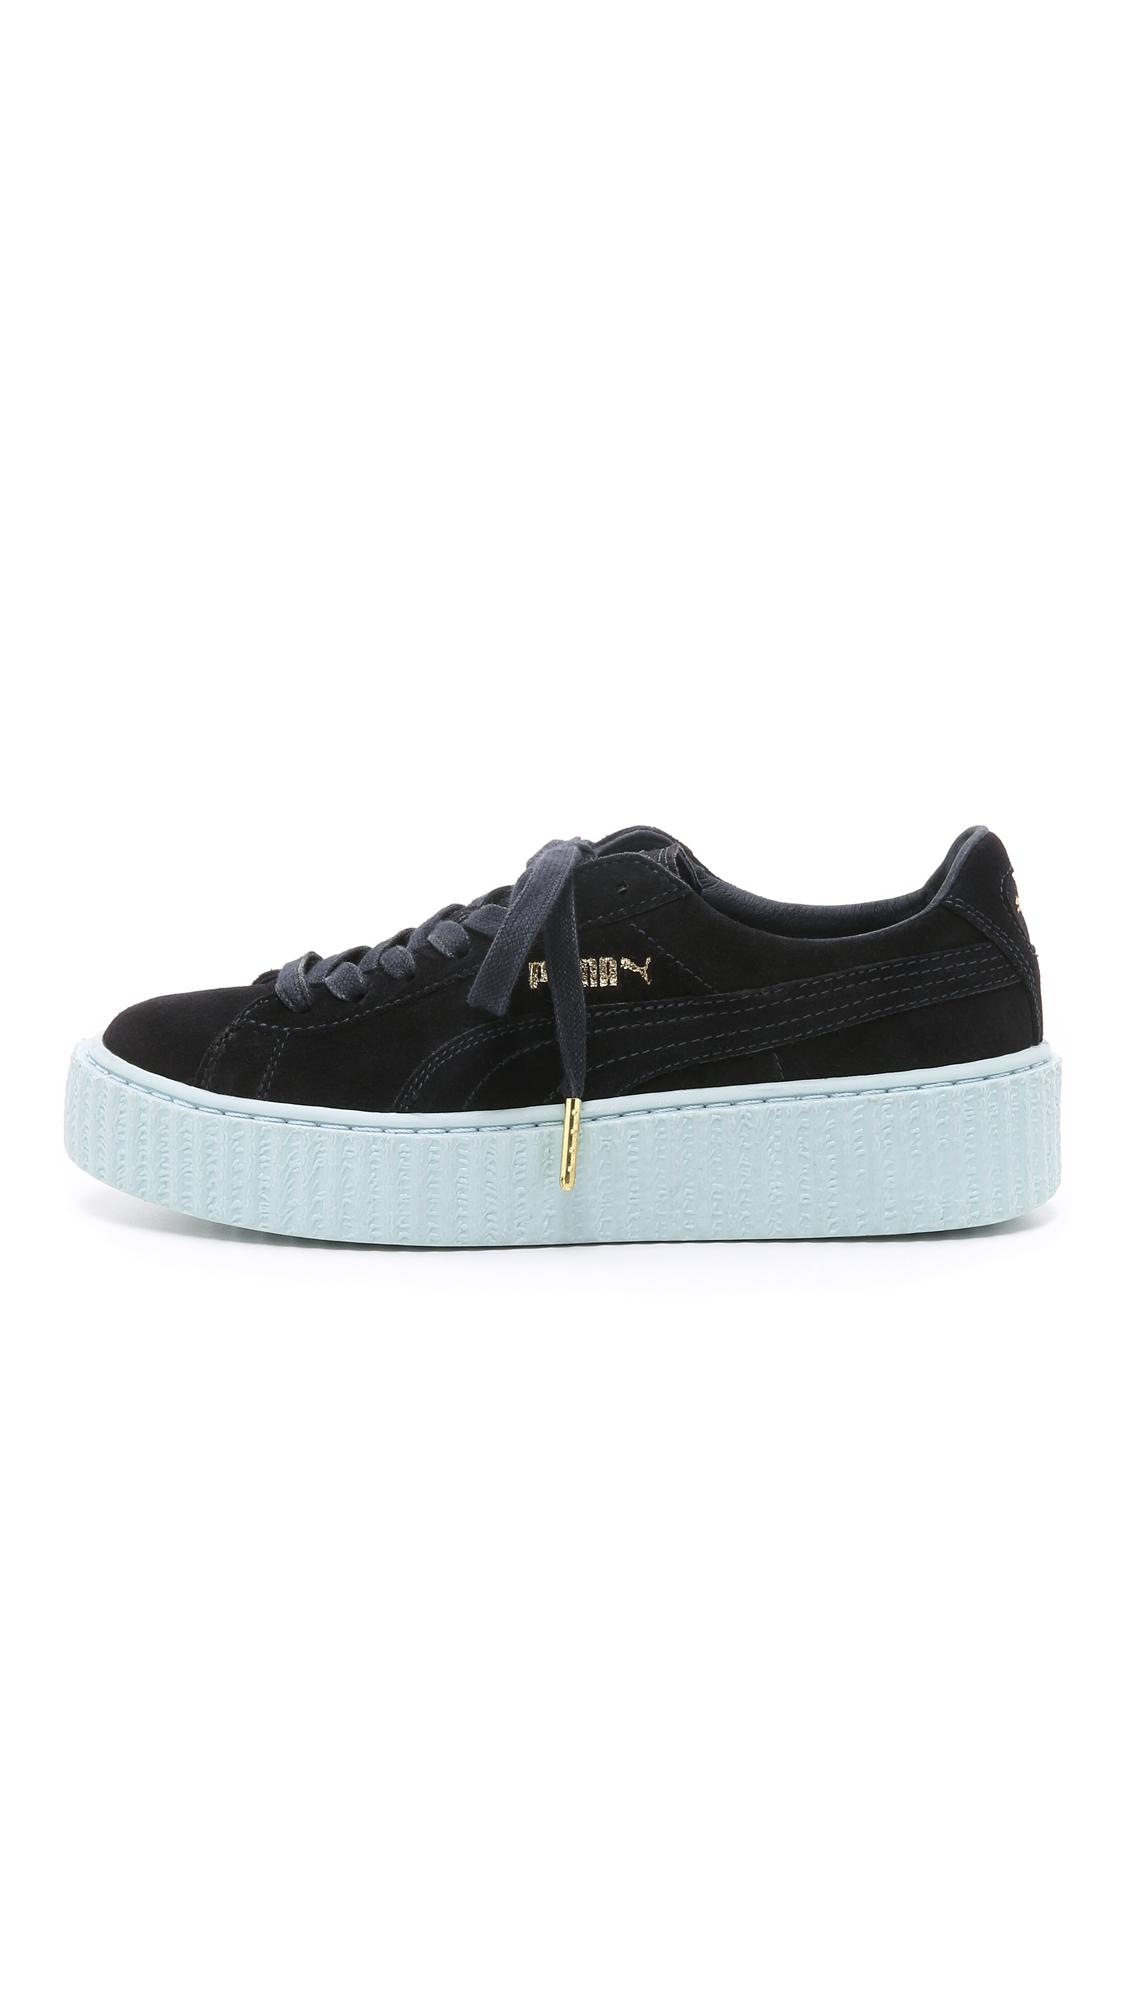 6b7e1f46274 Lyst - PUMA X Rihanna Creeper Sneakers - Pea Coat cool Blue in Green